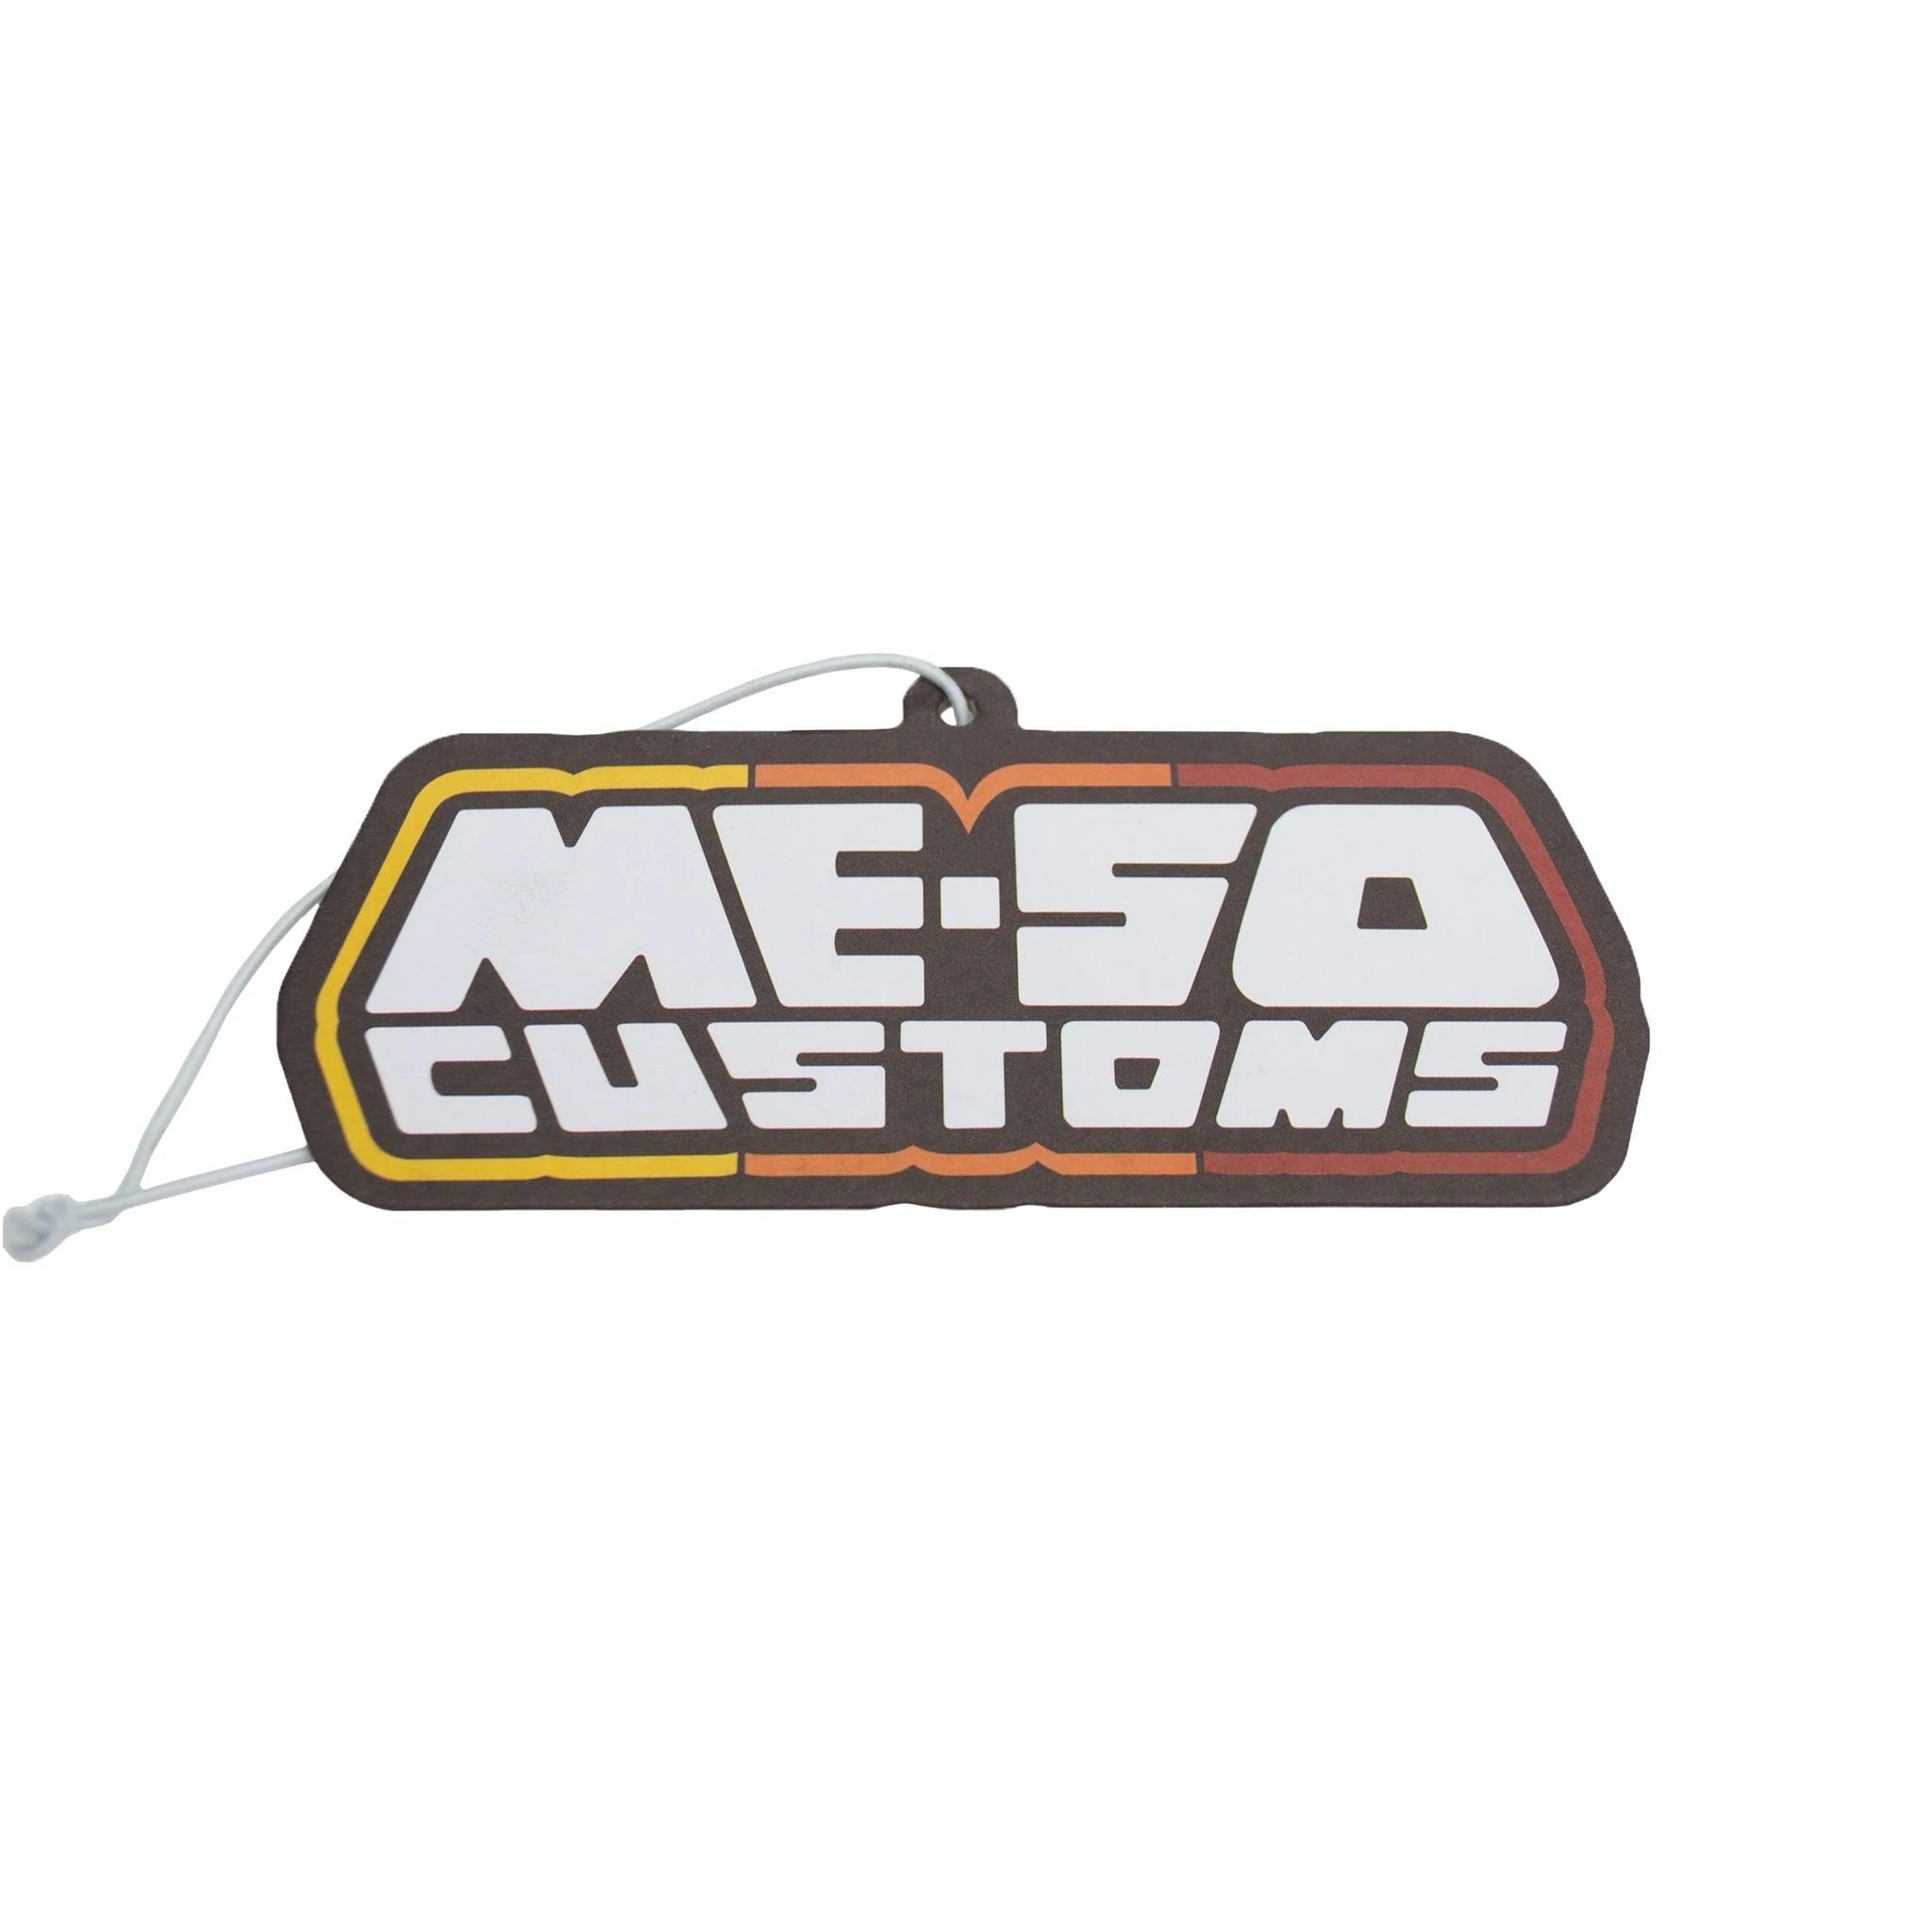 【 Meso Customs 】 MESO Air Freshener